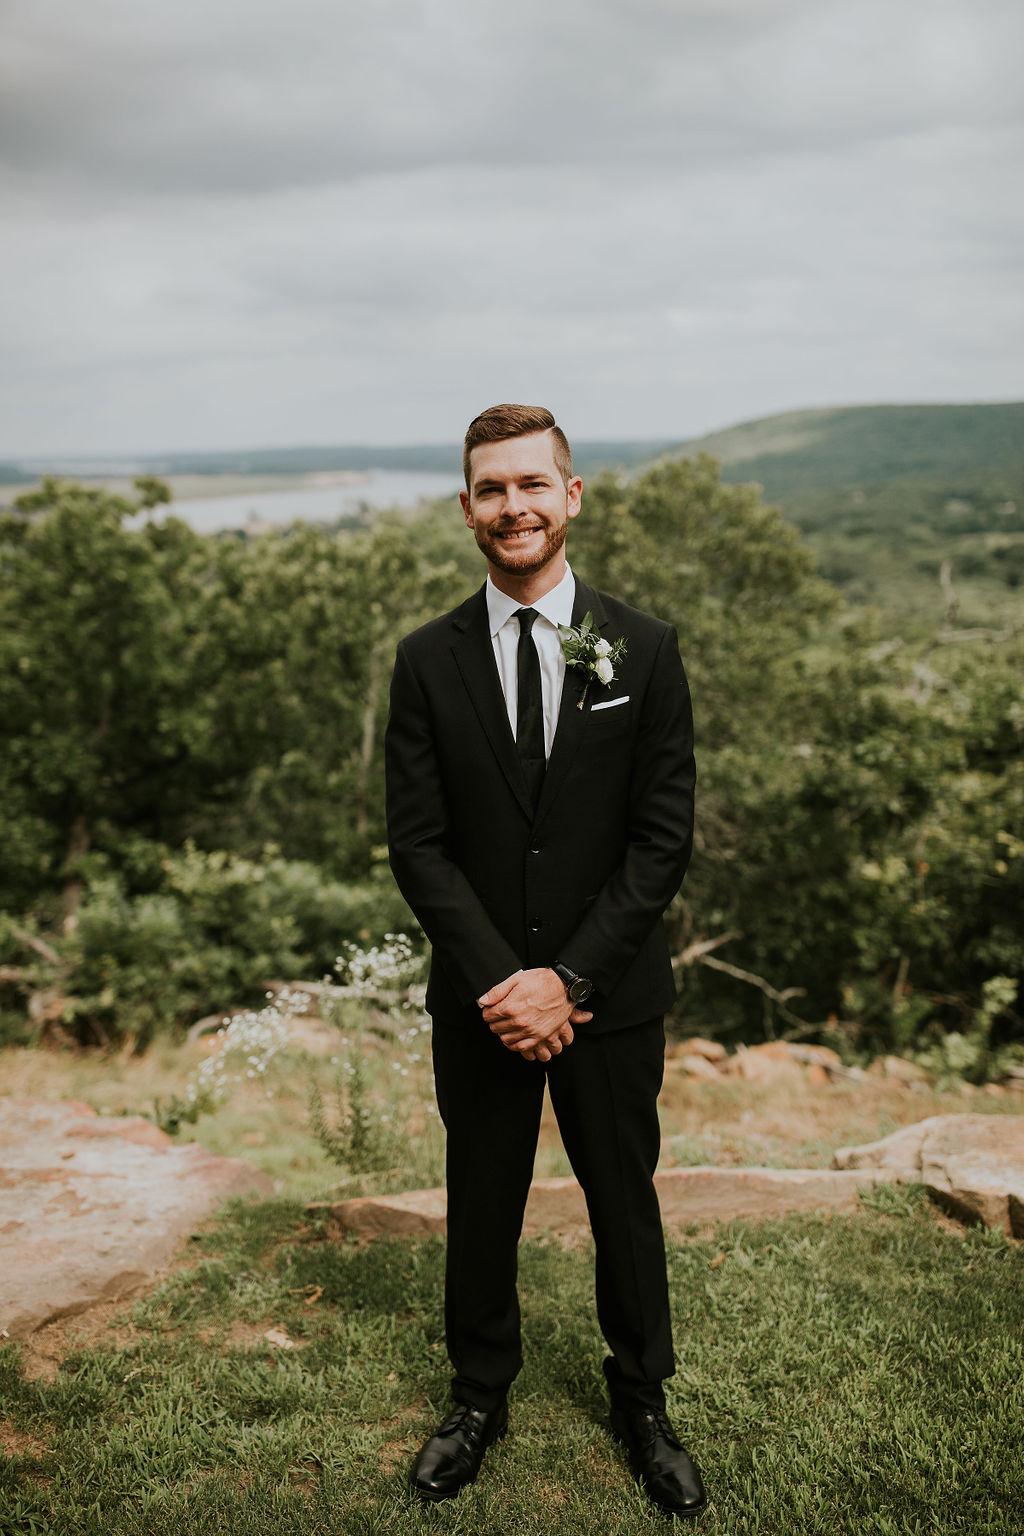 Bright light white barn wedding venue with a view Tulsa Oklahoma 18.jpg